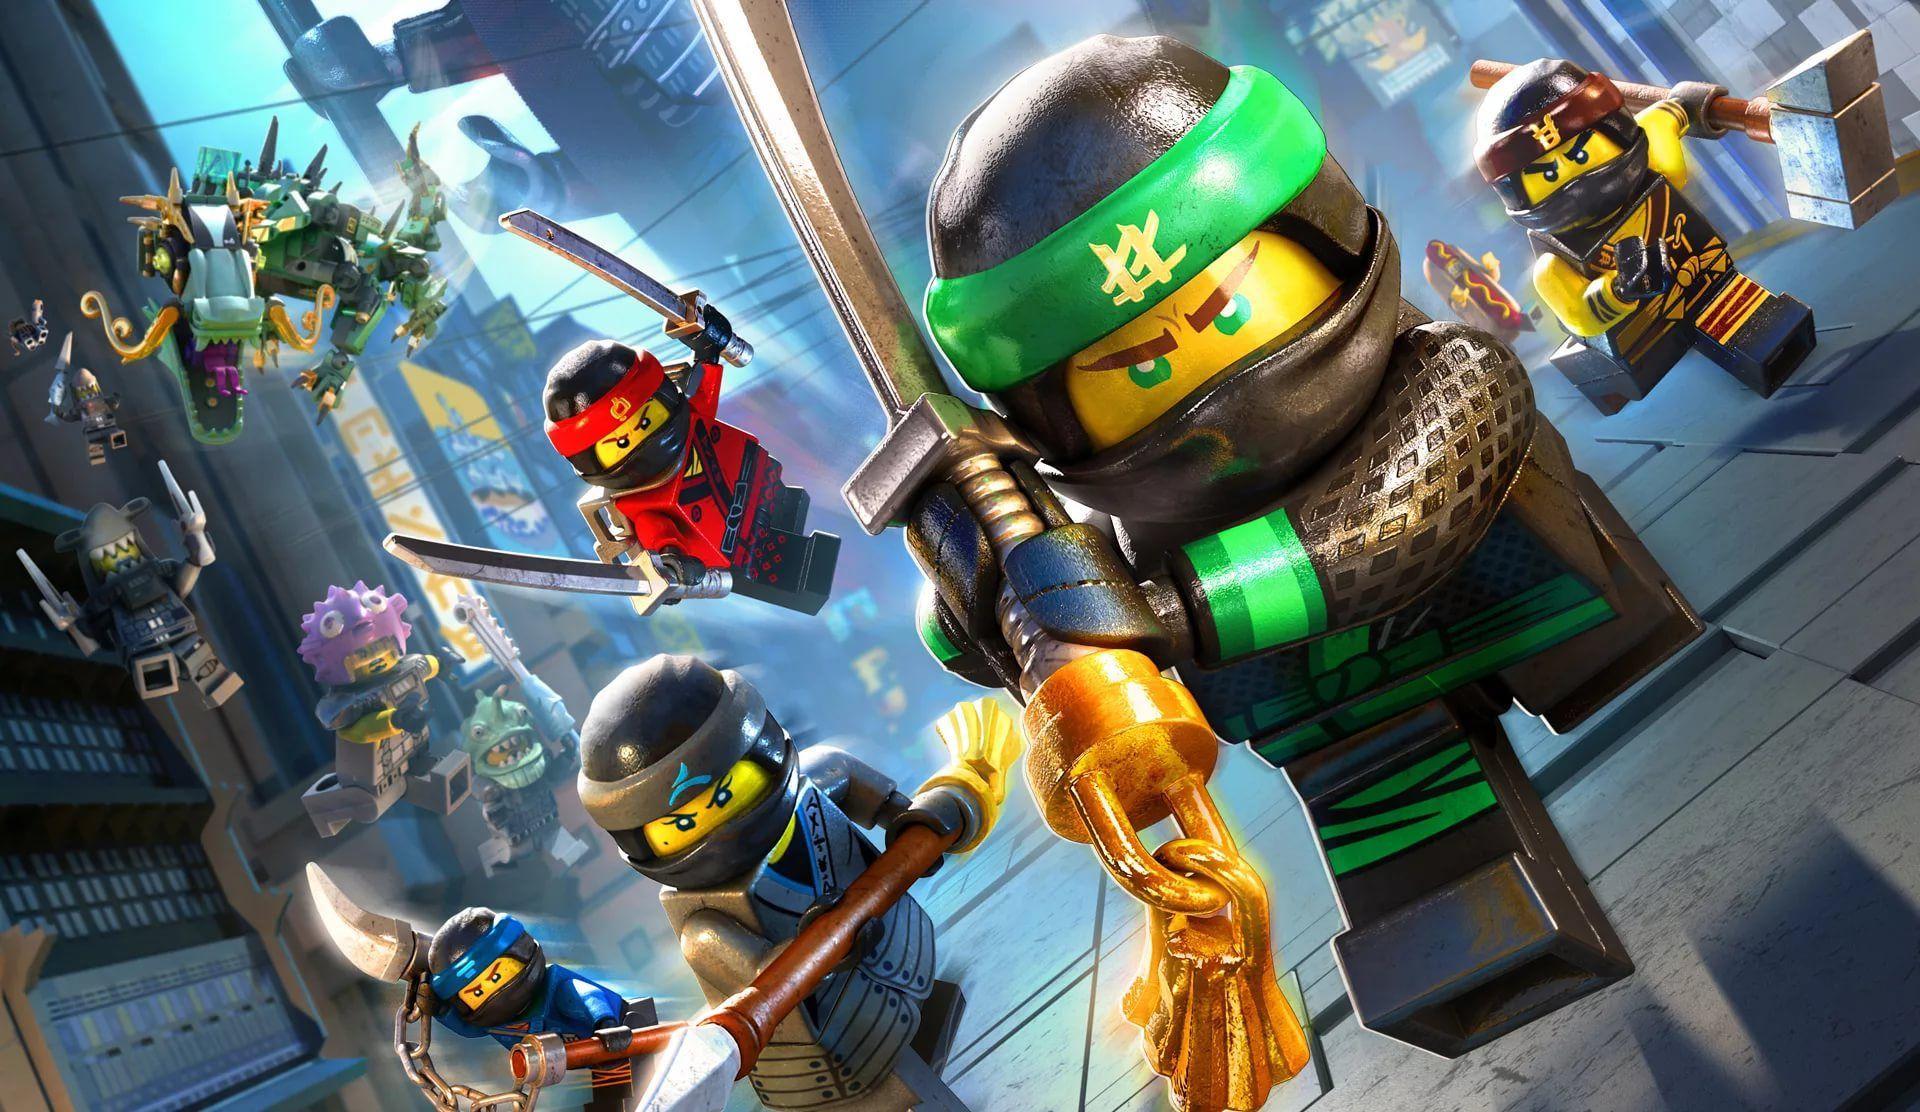 lego ninjago wallpaper downloads